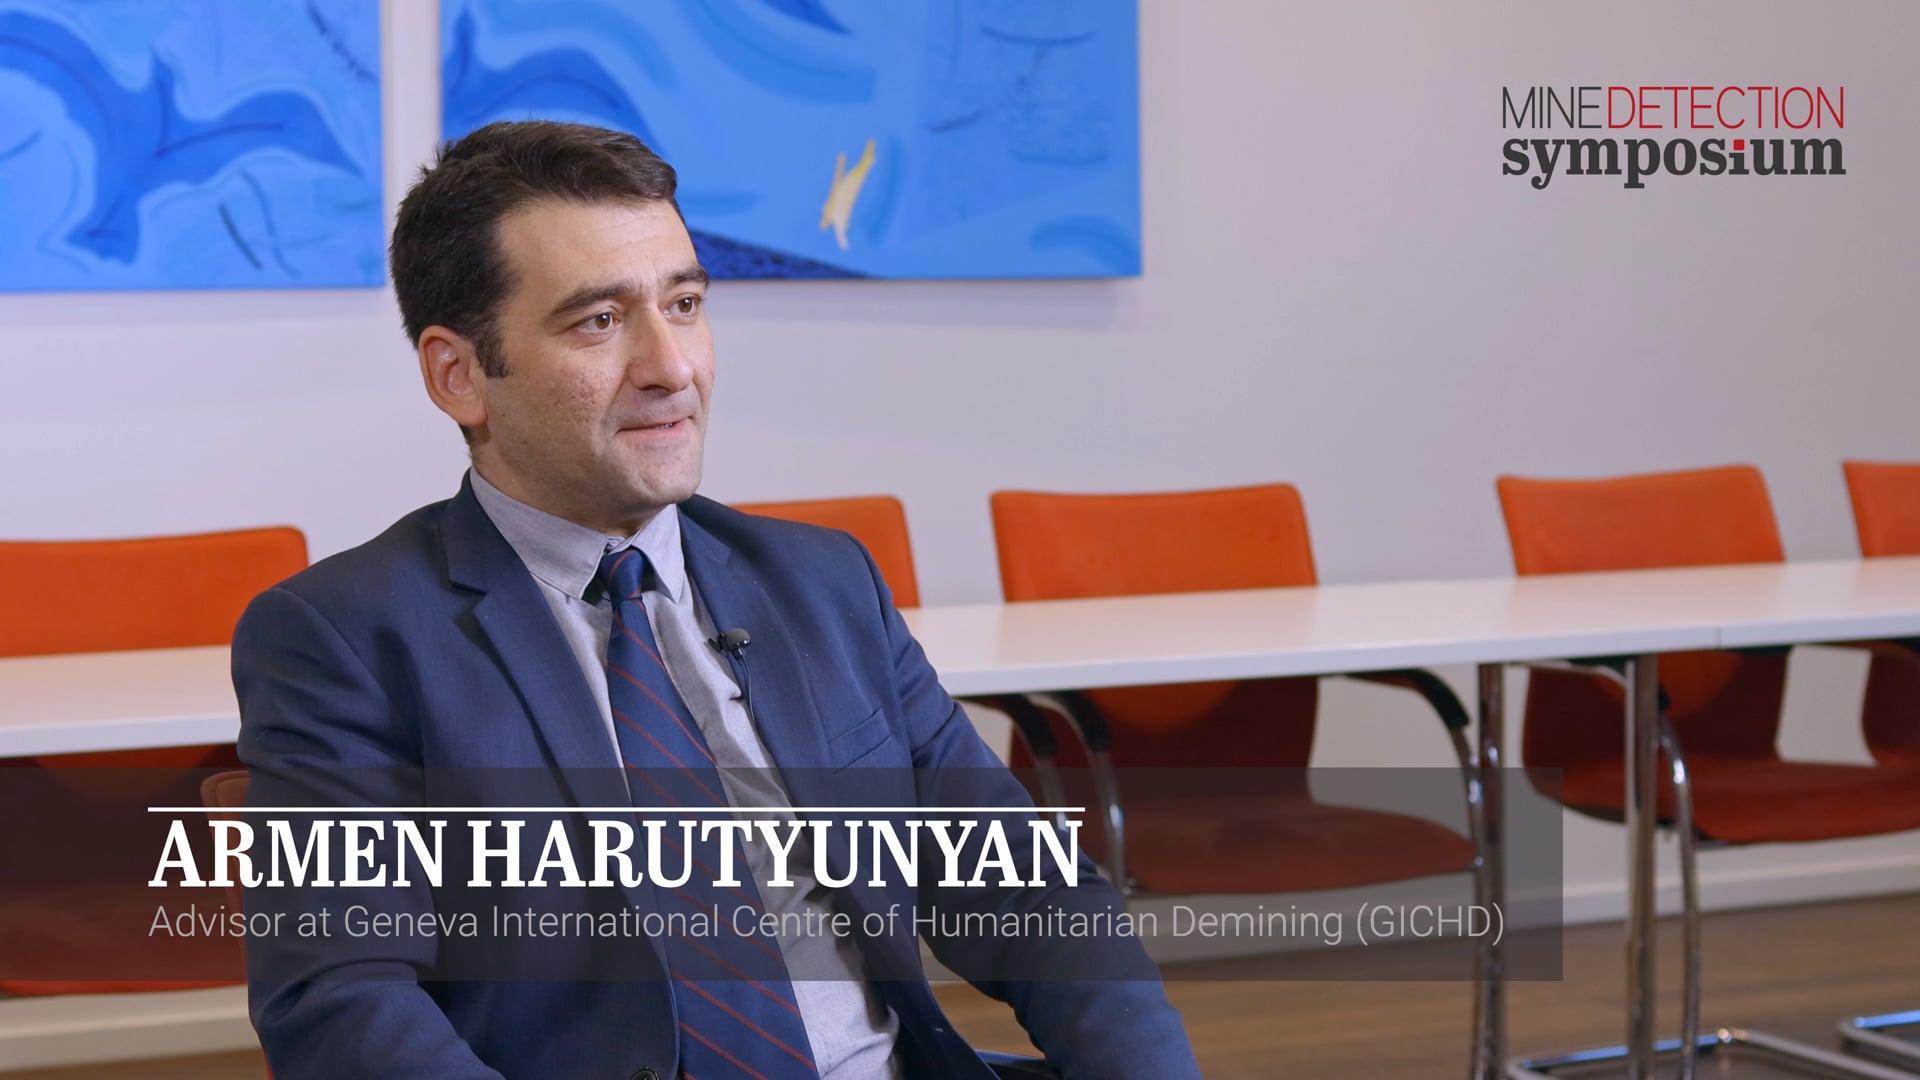 Armen Harutyunyan - Symposium - Mine Detection Symposium 2019